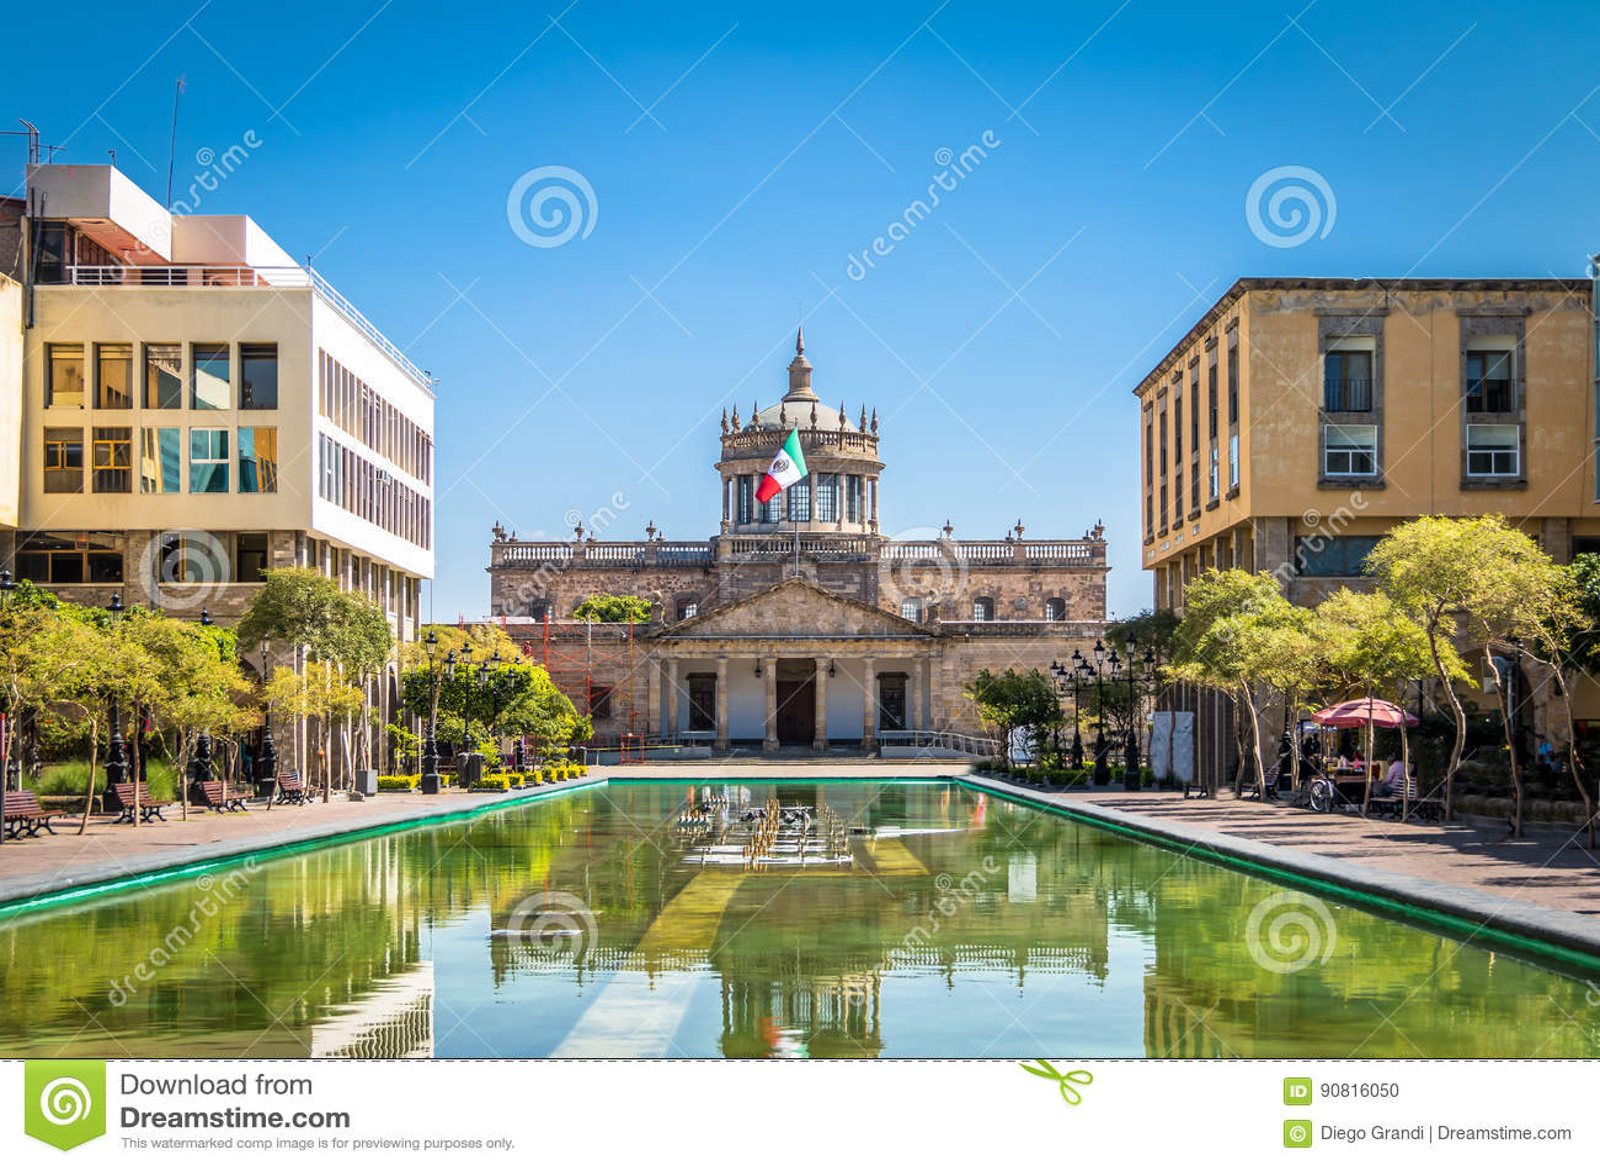 Hospicio小屋小屋文化学院-瓜达拉哈拉,哈利斯科州,墨西哥